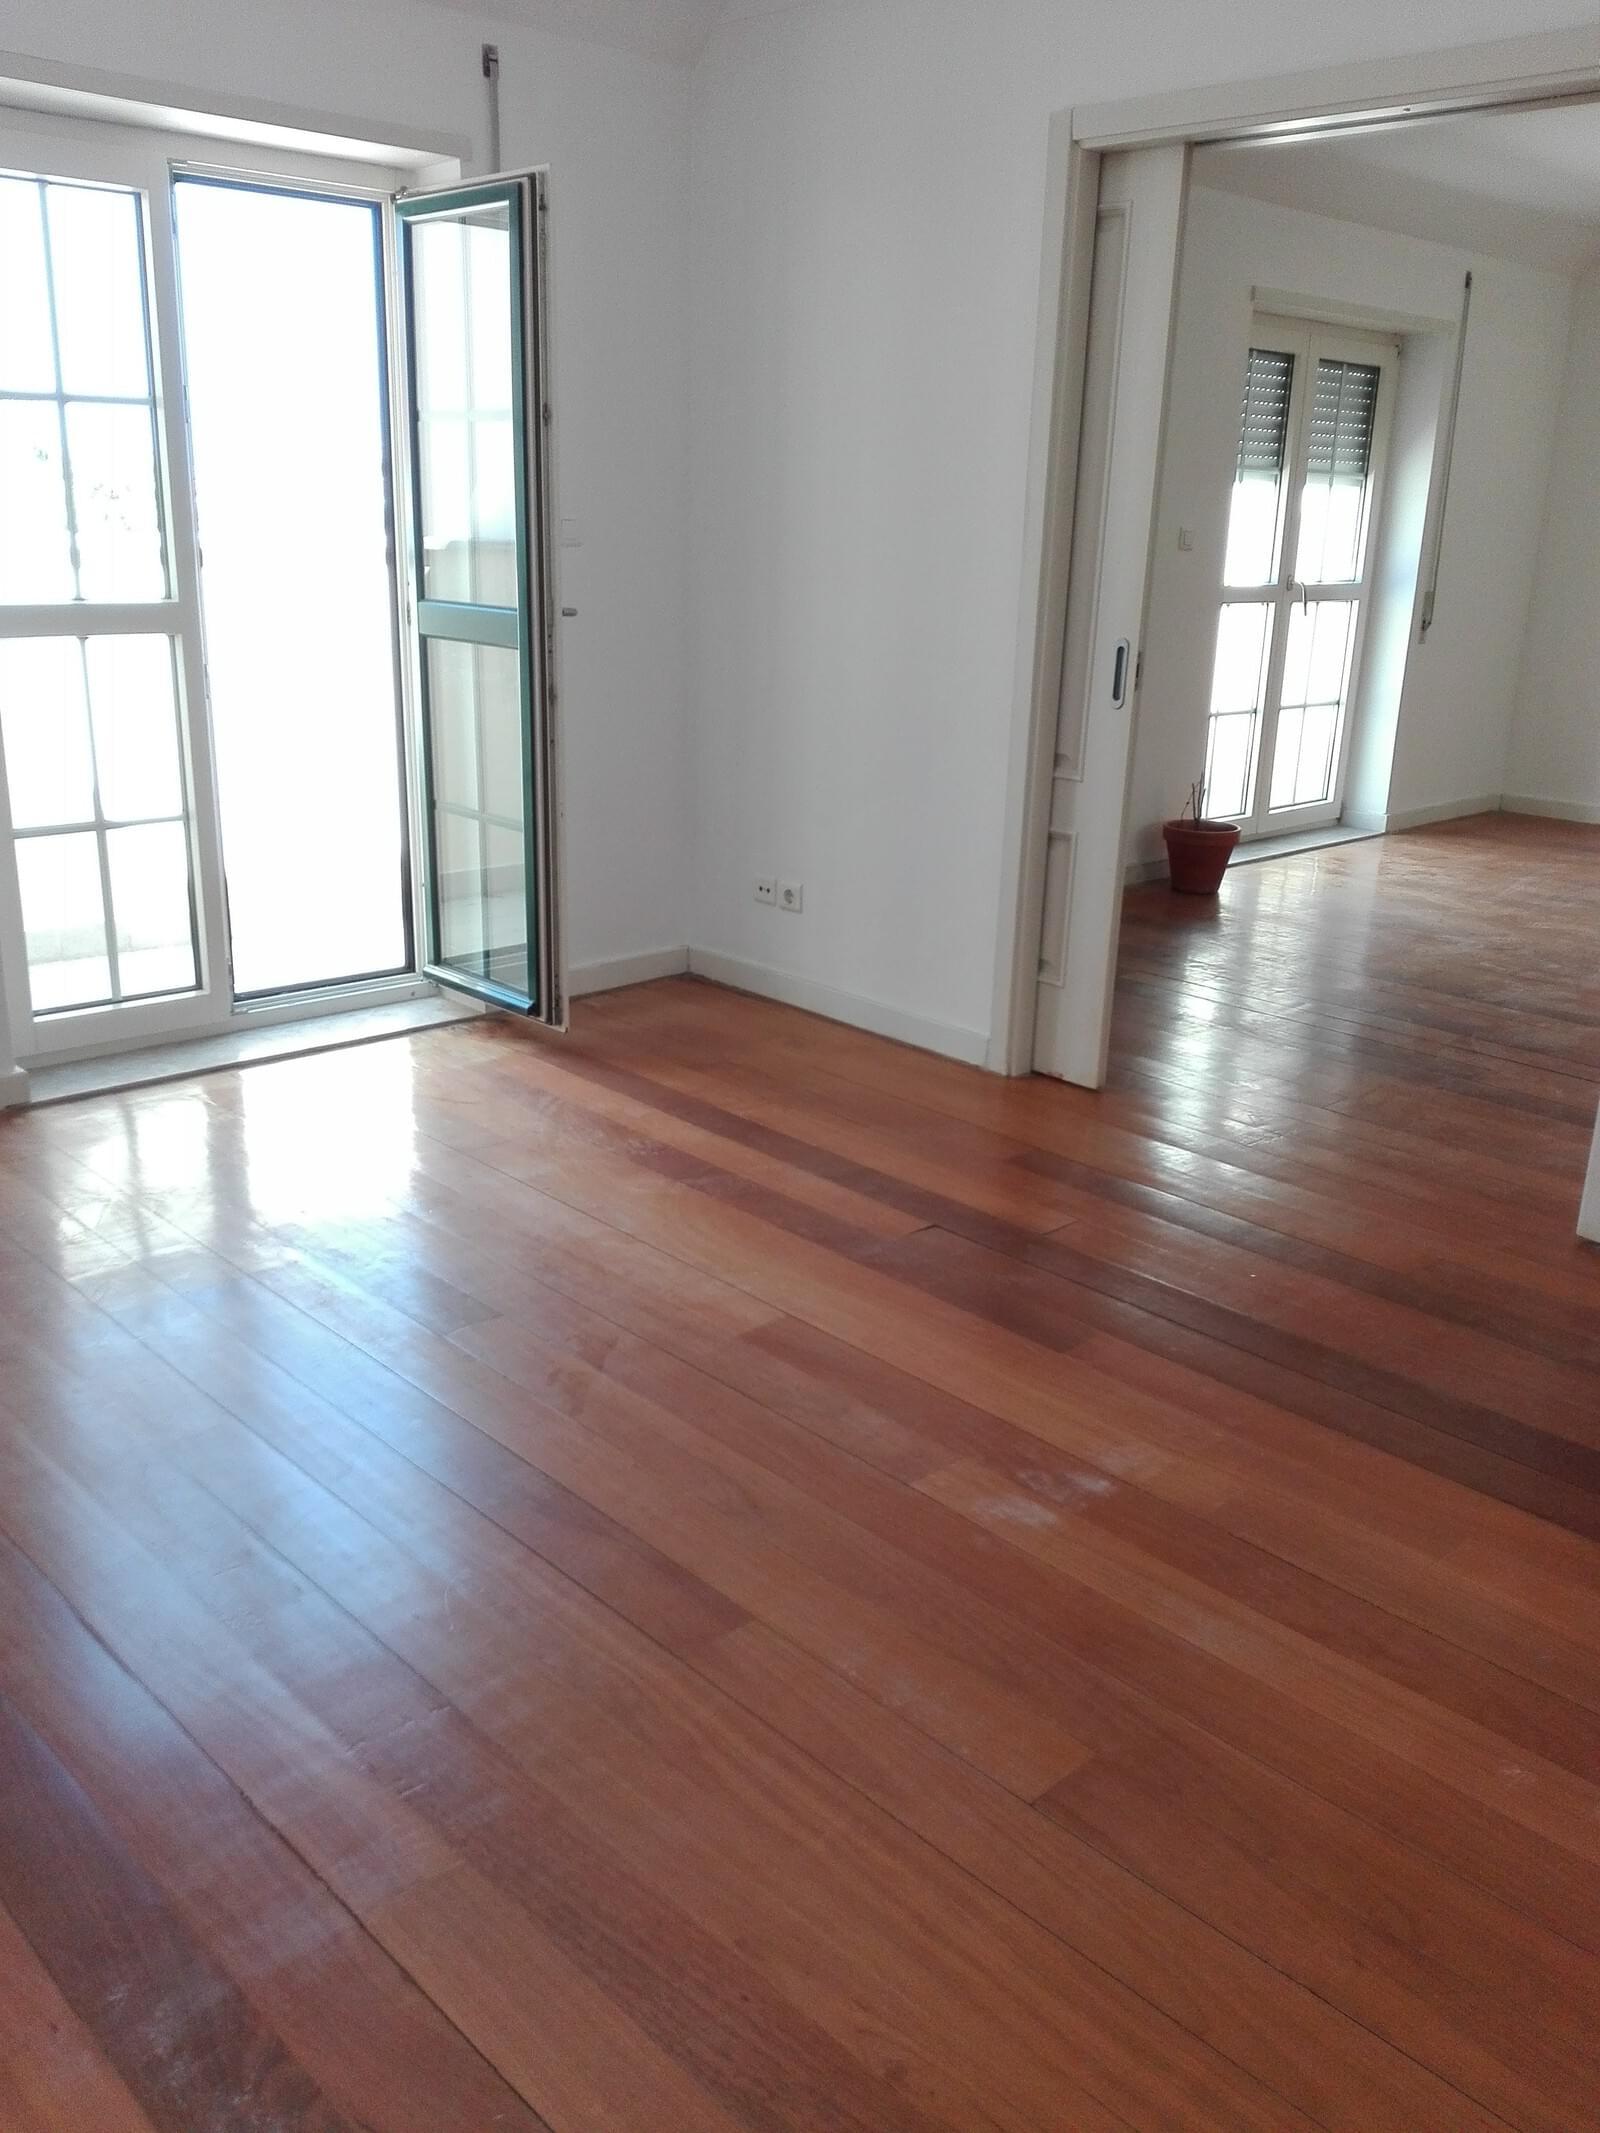 pf17908-apartamento-t1-lisboa-b2935241-0ac4-4190-baf0-90eb90167b3f